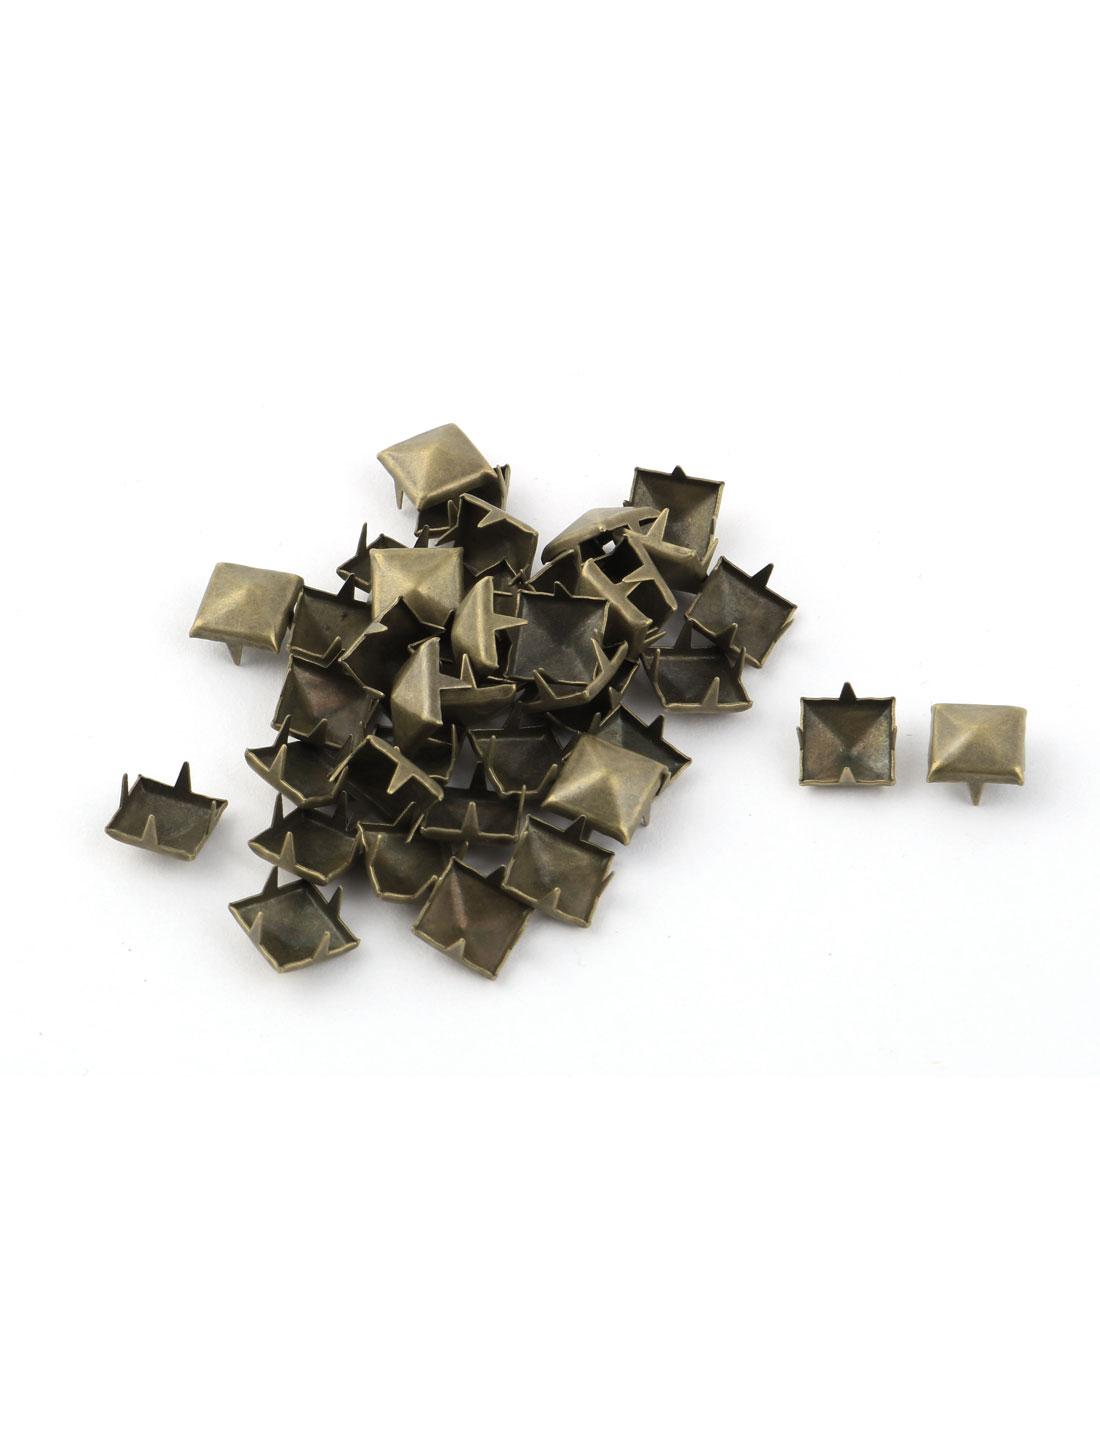 Metal Square Pyramid Shape DIY Rivet Studs Bronze Tone 9mm 40pcs for Clothing Bag